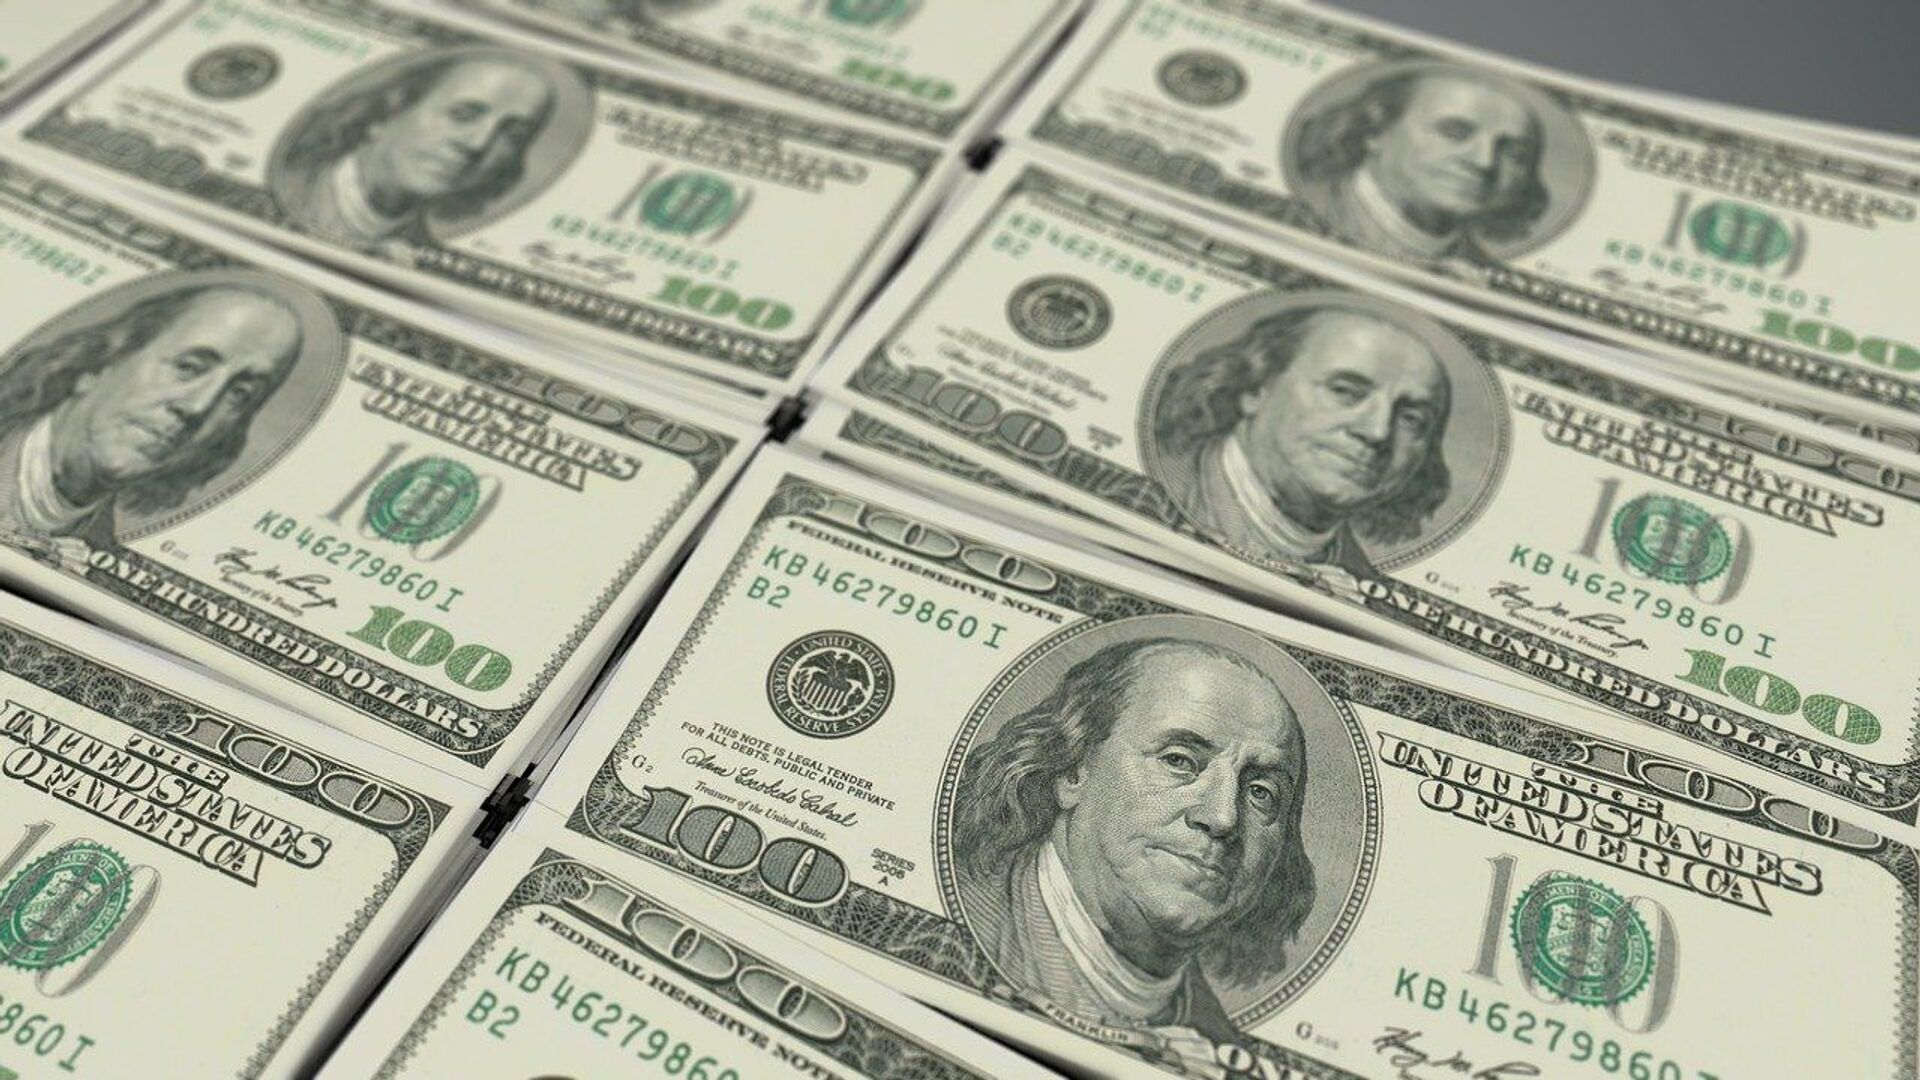 Доллары США - Sputnik Грузия, 1920, 16.09.2021